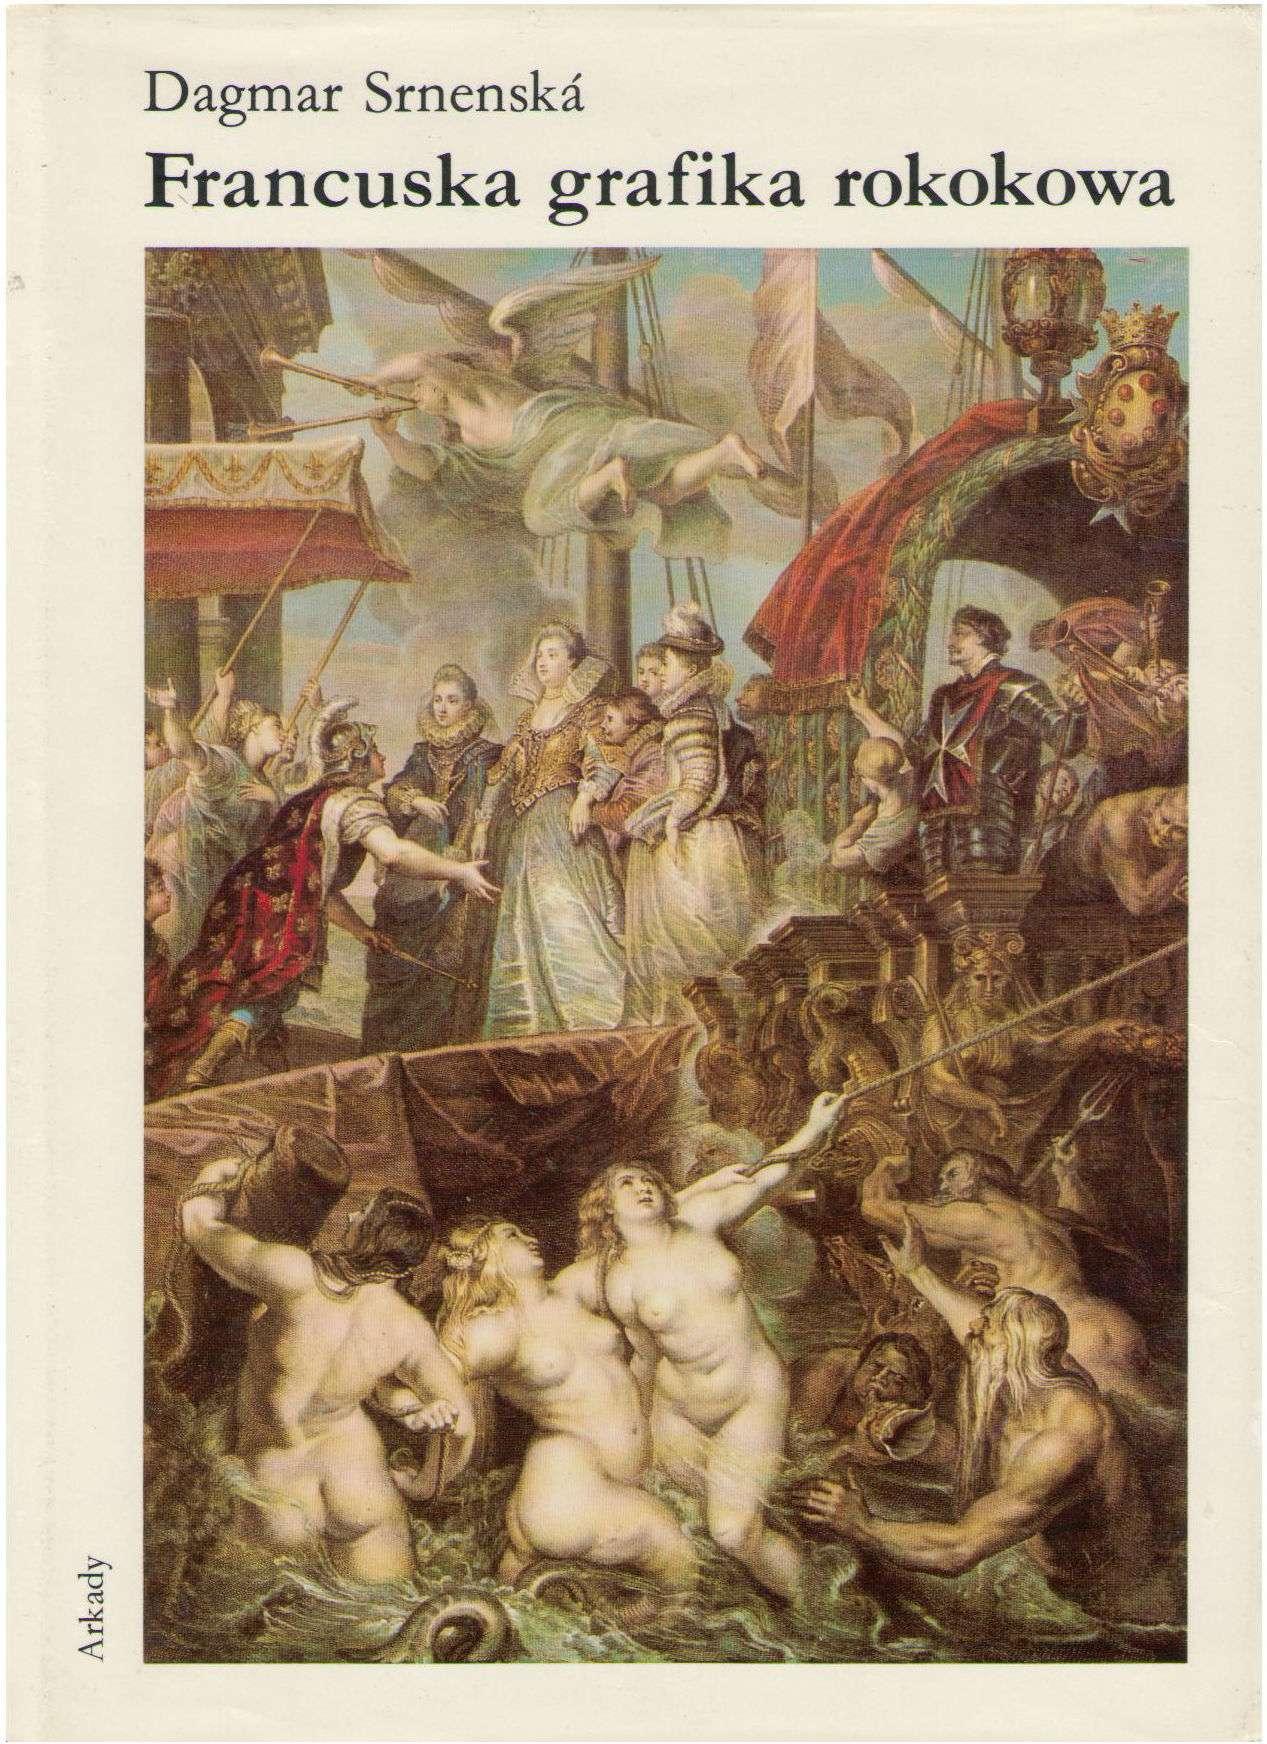 Francuska Grafika Rokokowa (Polish Edition), Dagmar Srnenska